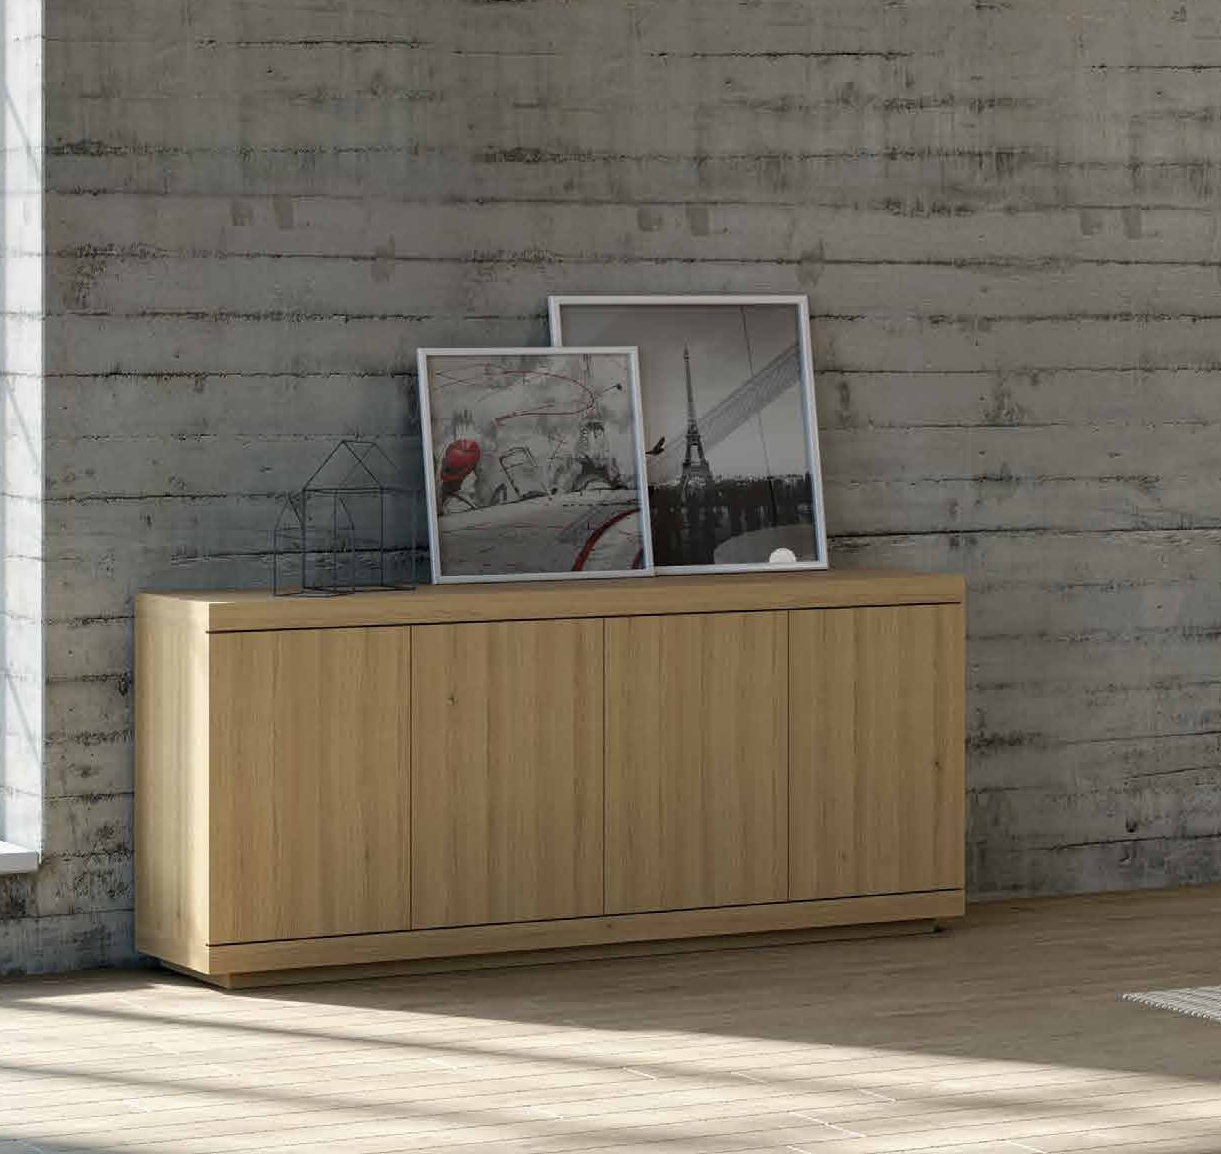 Aparador colección Terra AP06 - Aparador colección Terra AP06, Fabricado en madera de roble, aceite ecológico y cera natural